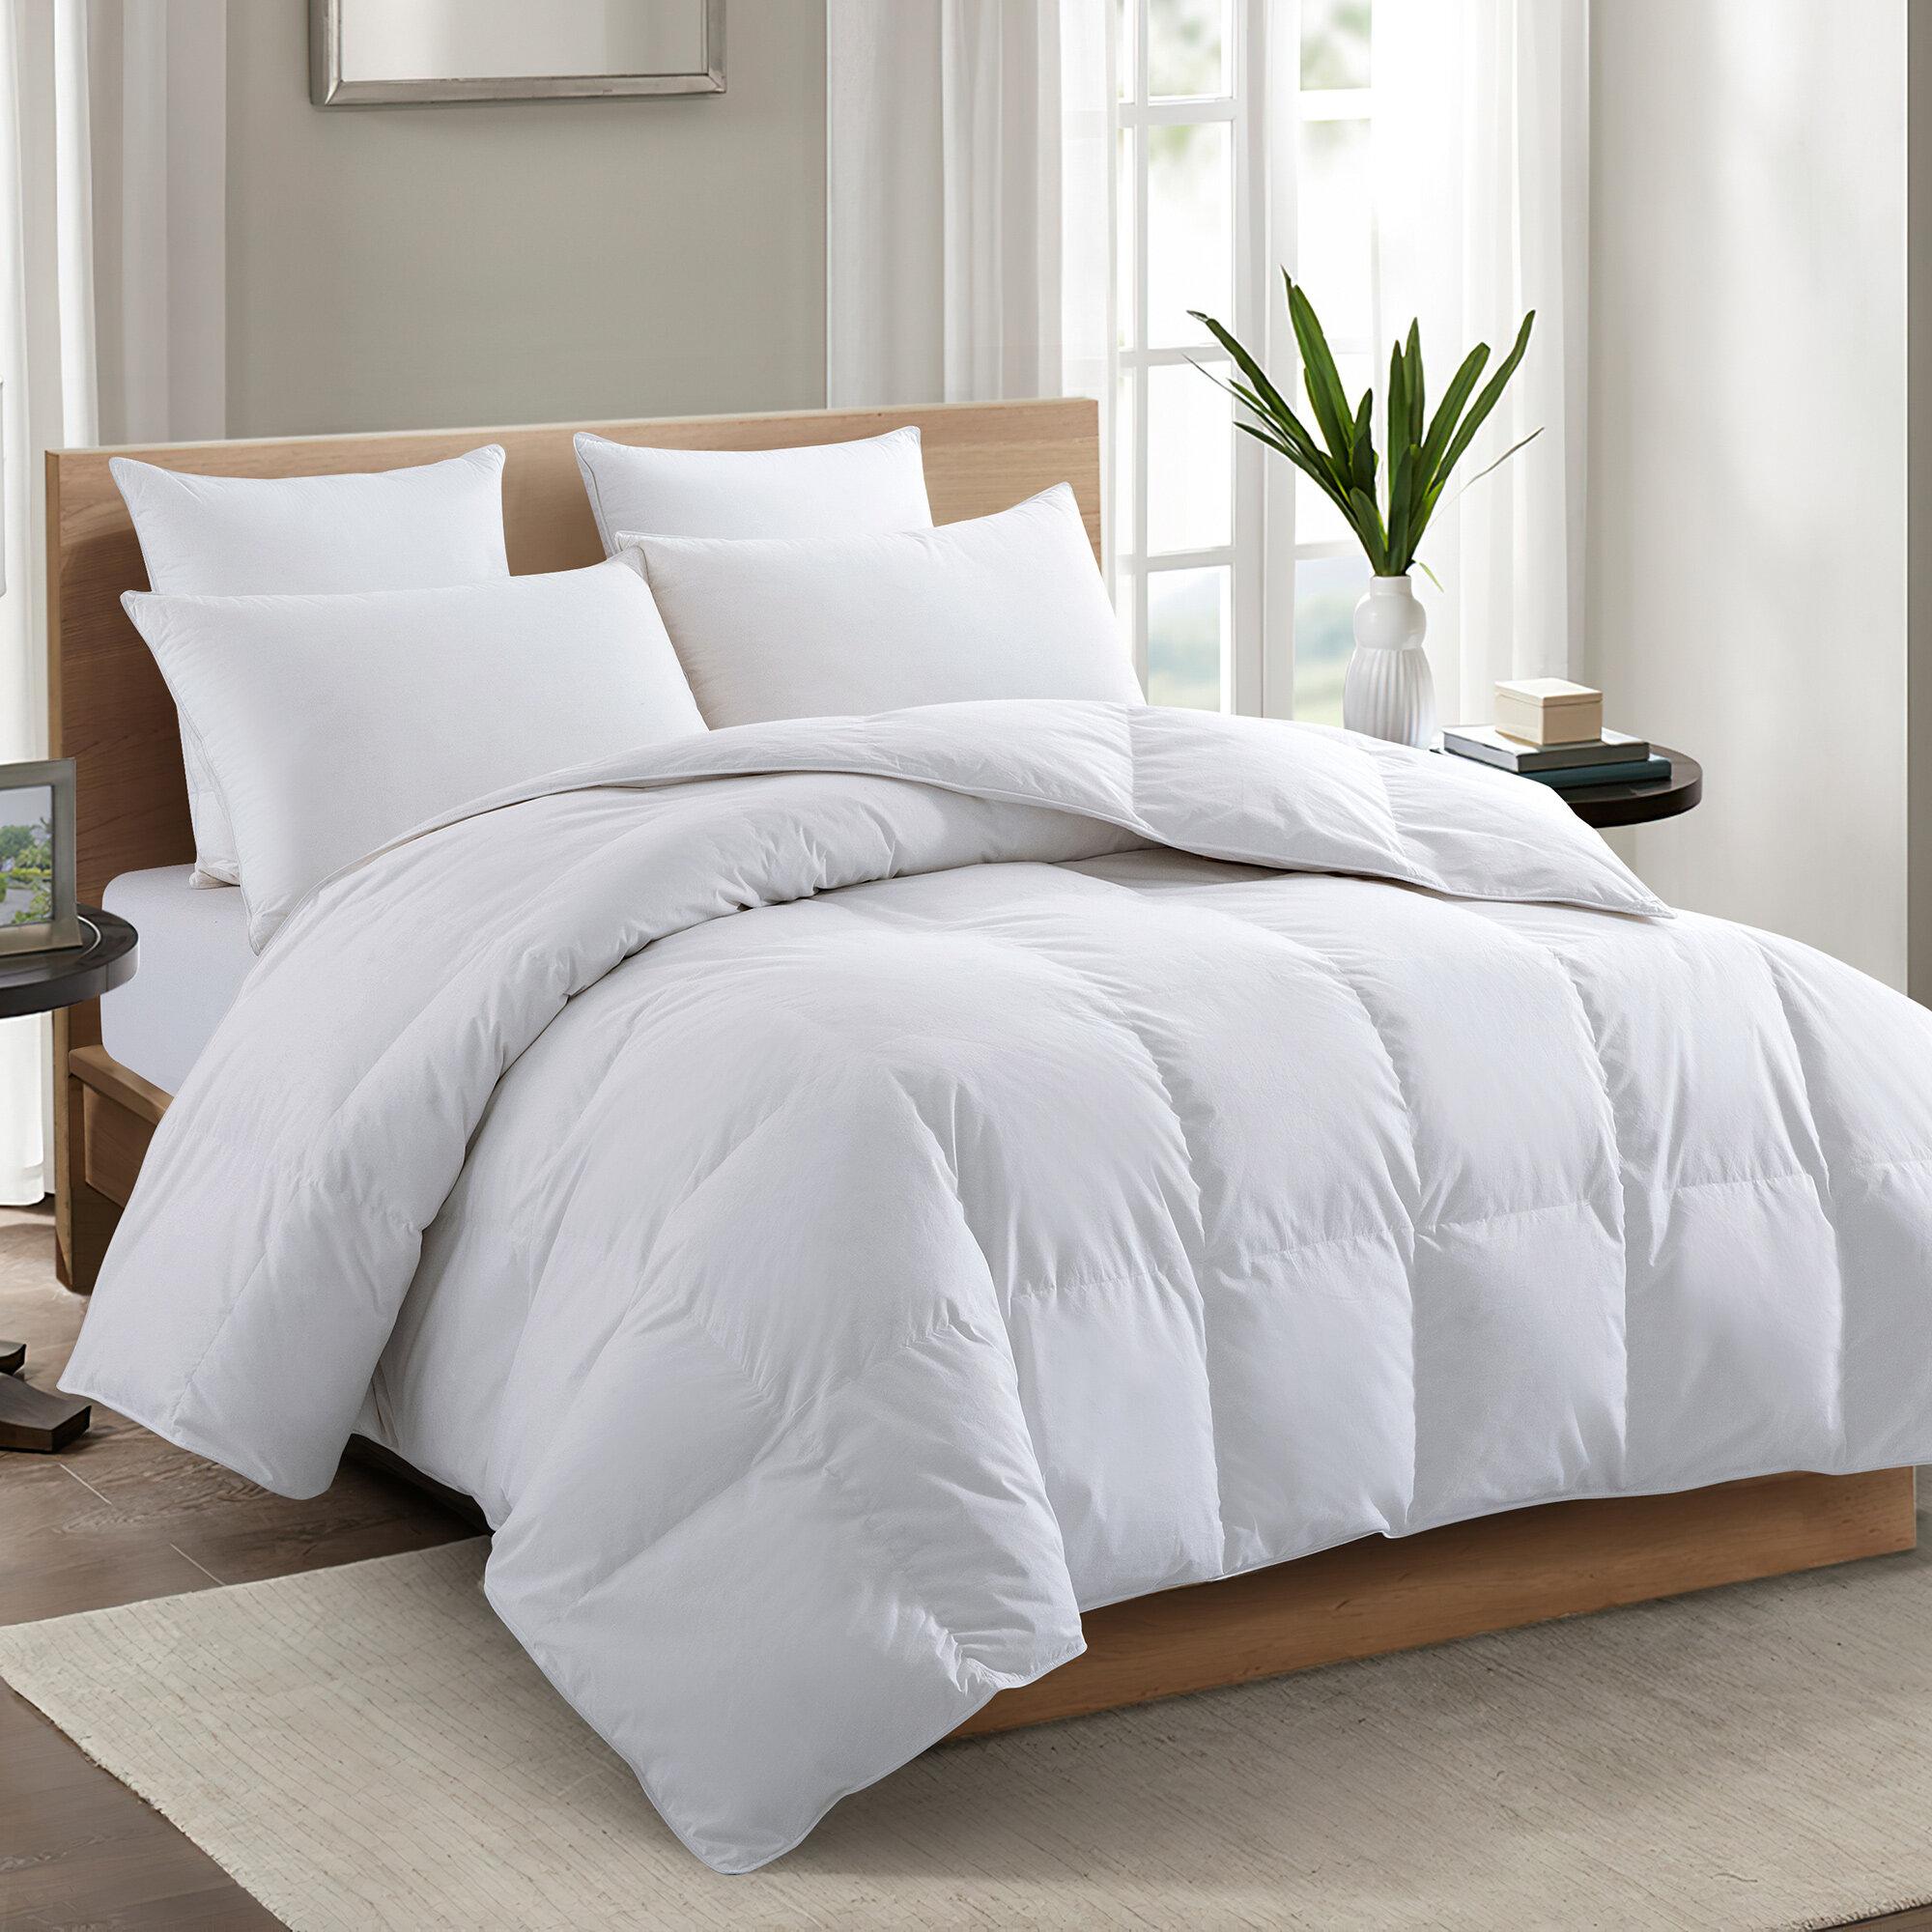 Eider Ivory 600 Fill Power All Season 75 White Down Comforter Reviews Wayfair